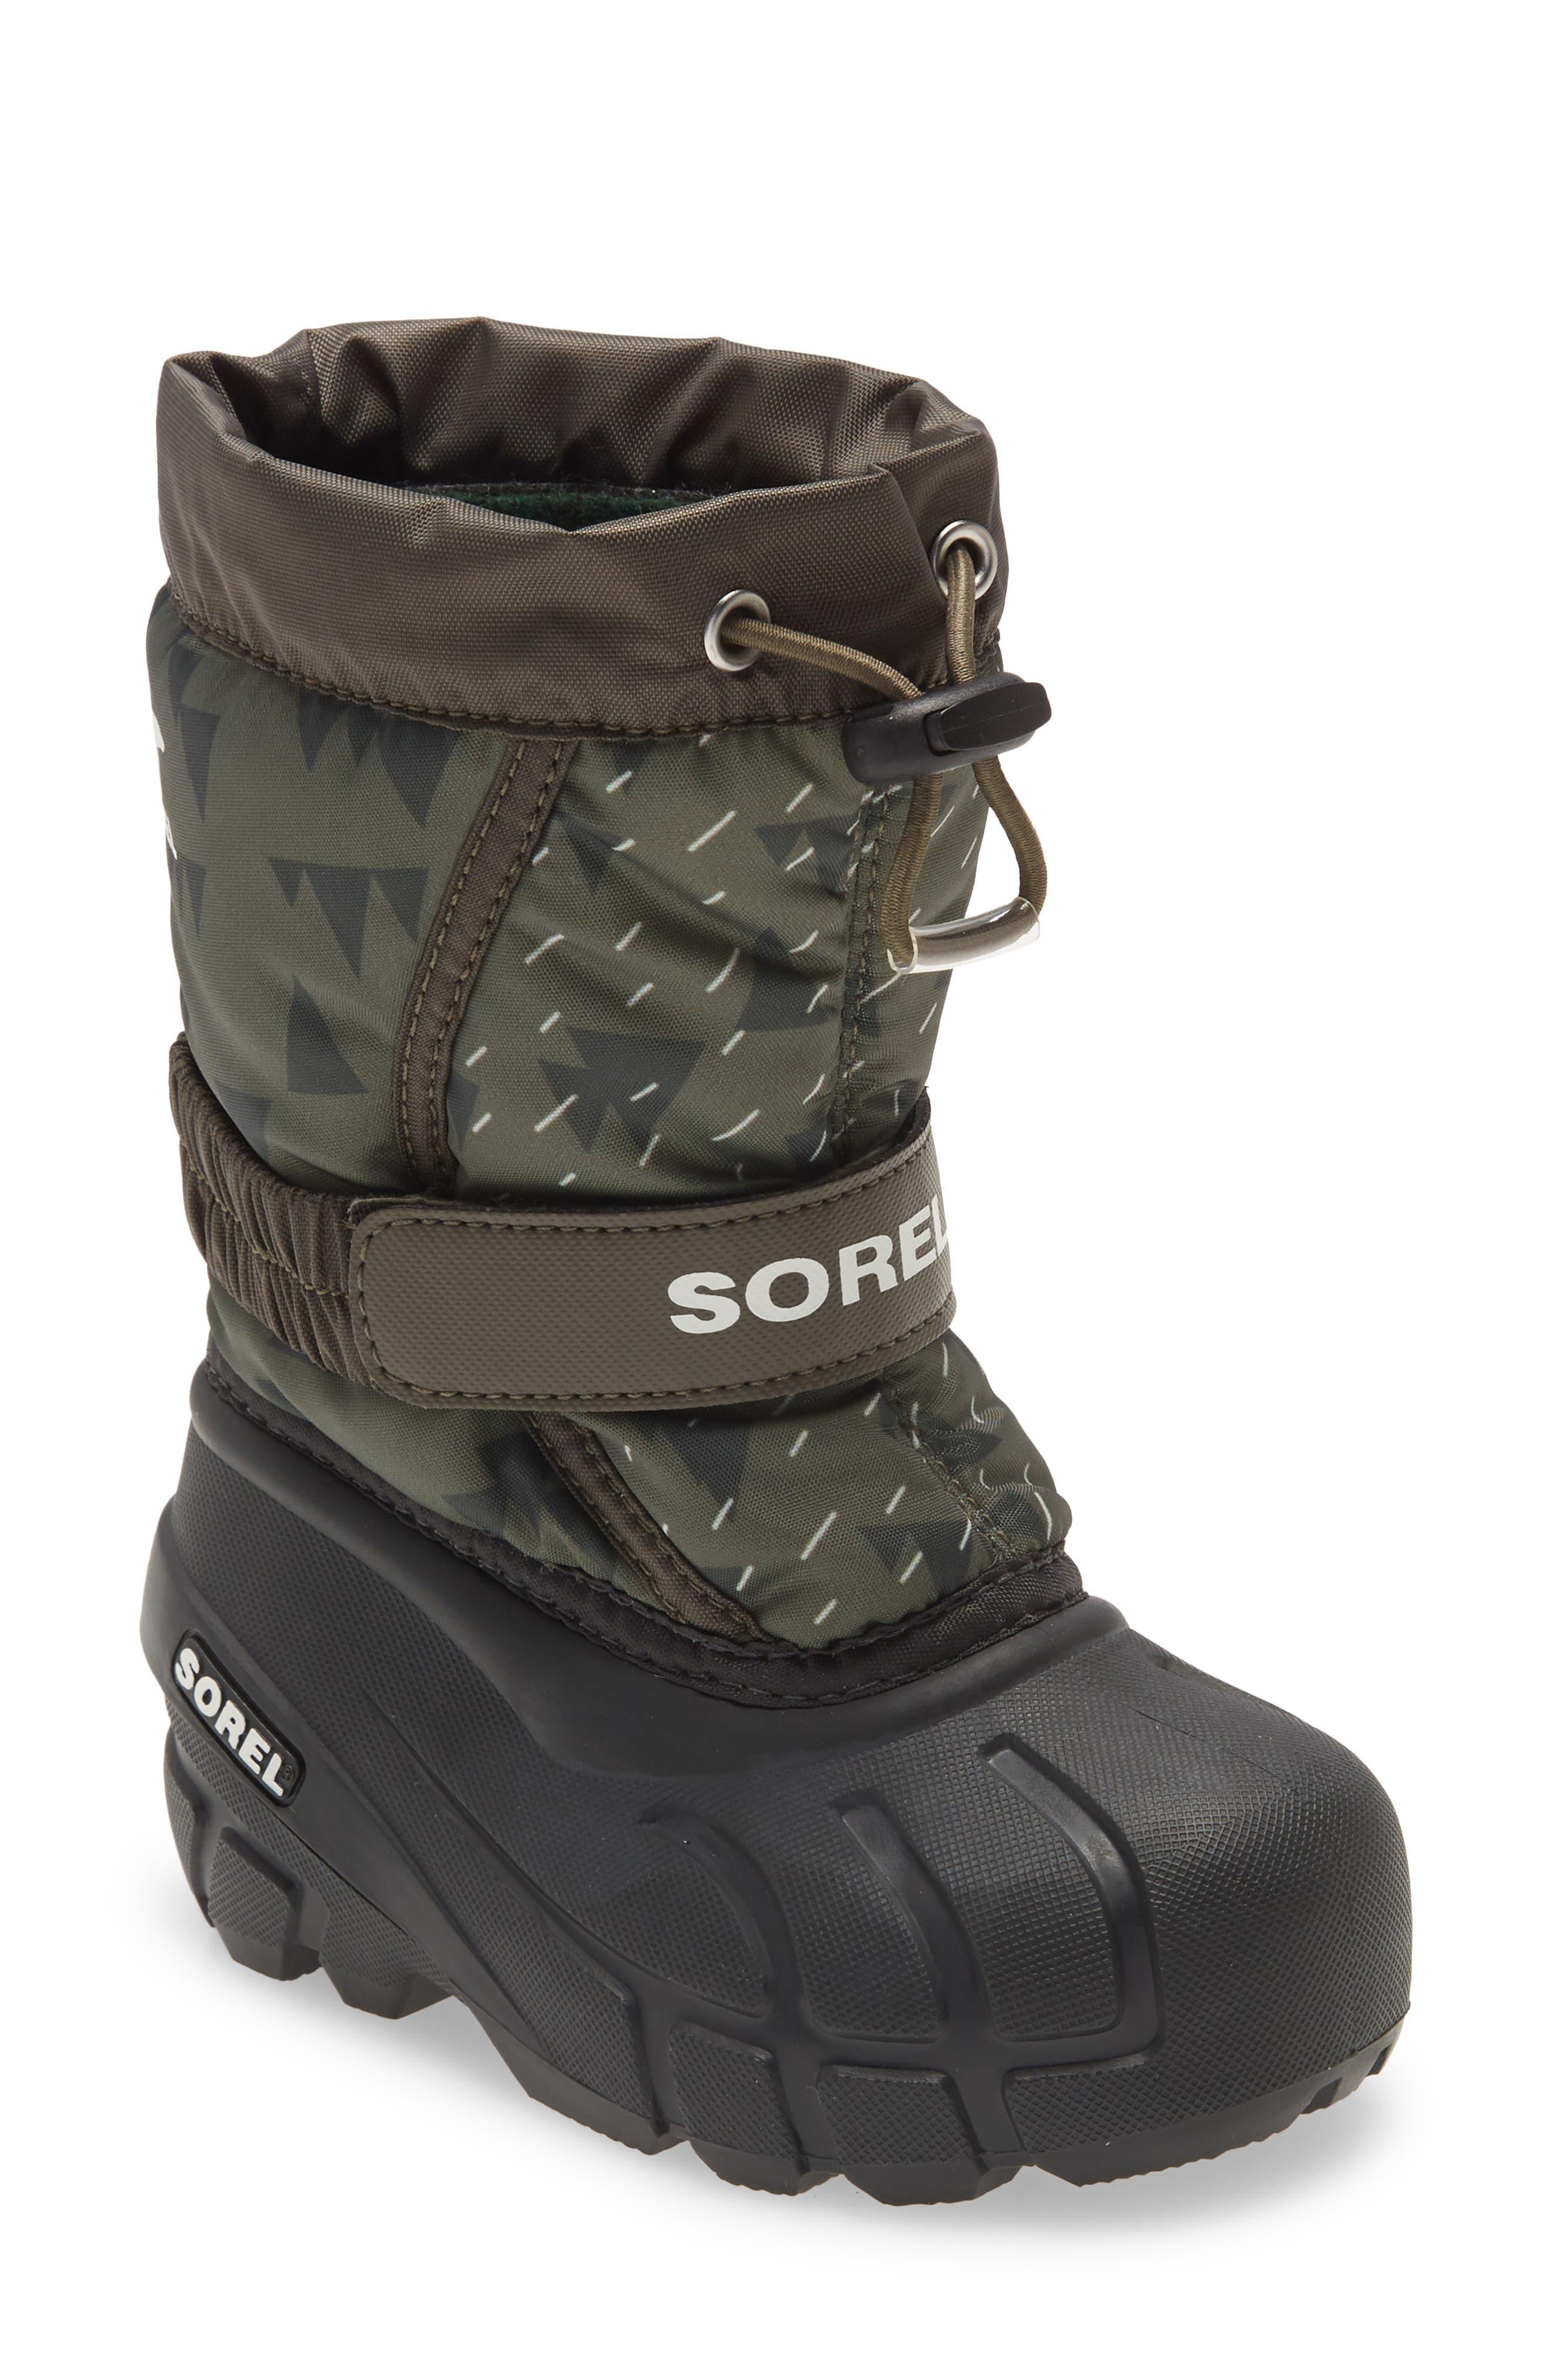 SOREL Flurry Weather Resistant Snow Boot (Toddler, Little Kid & Big Kid)   Nordstrom